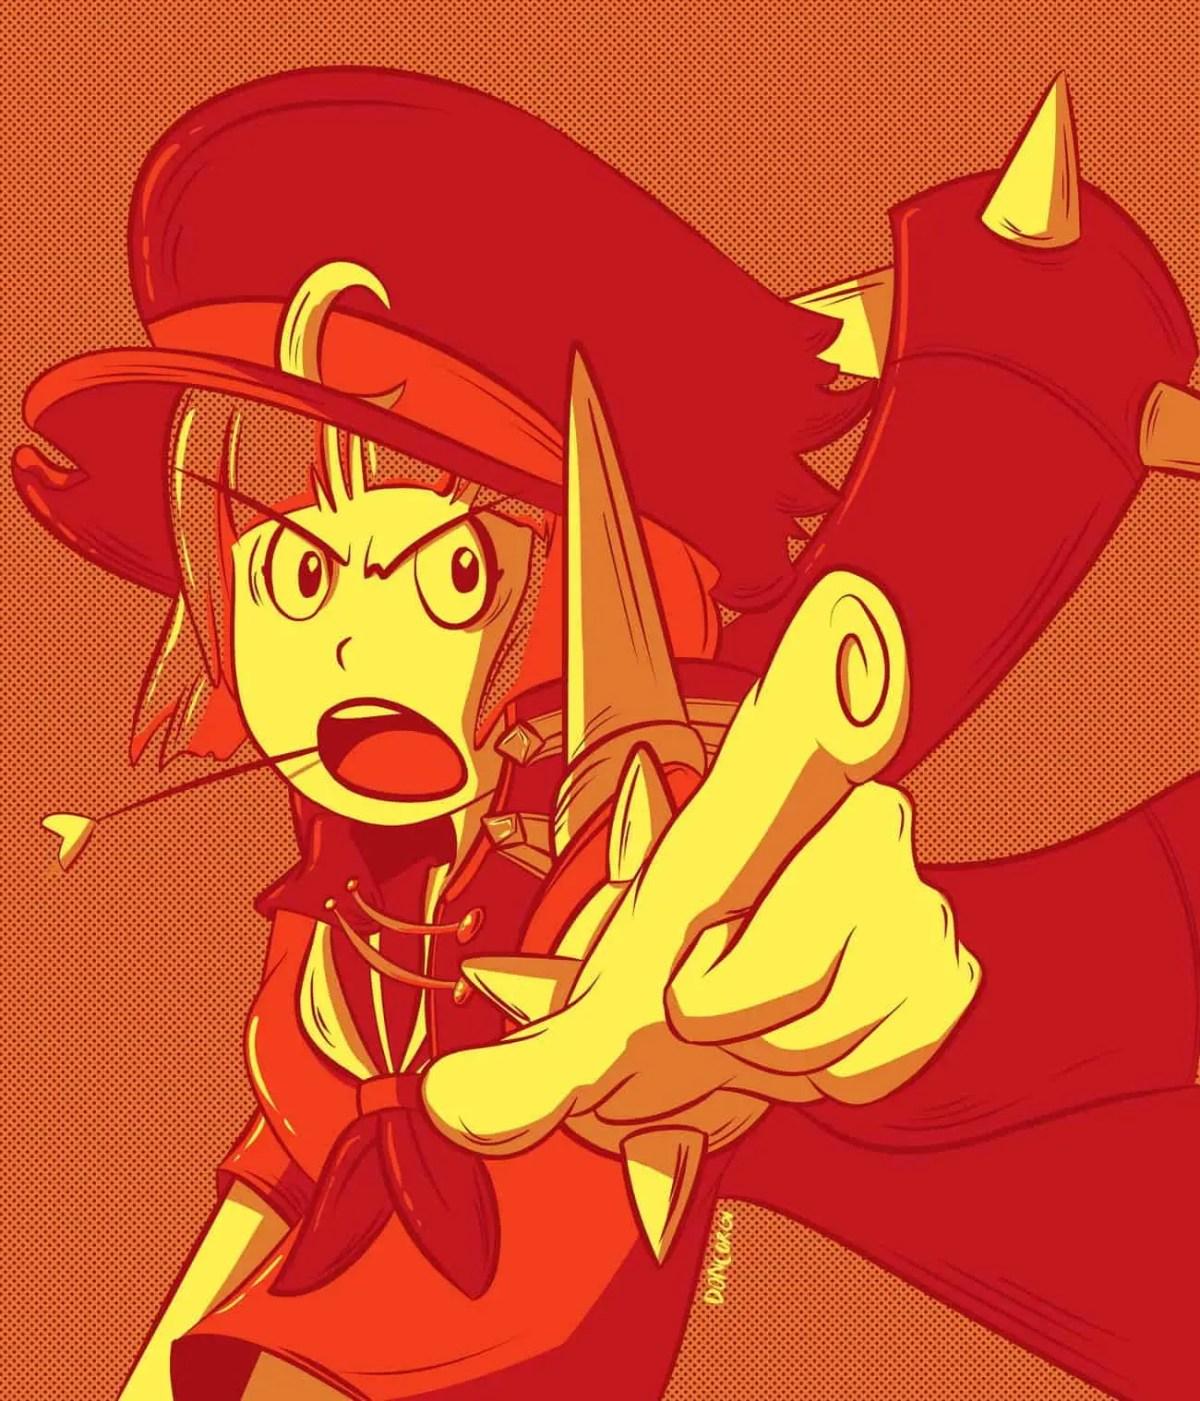 mako mankanshoku, kill la kill, anime, fan art, fanart, digital painting, illustration, female character, badass